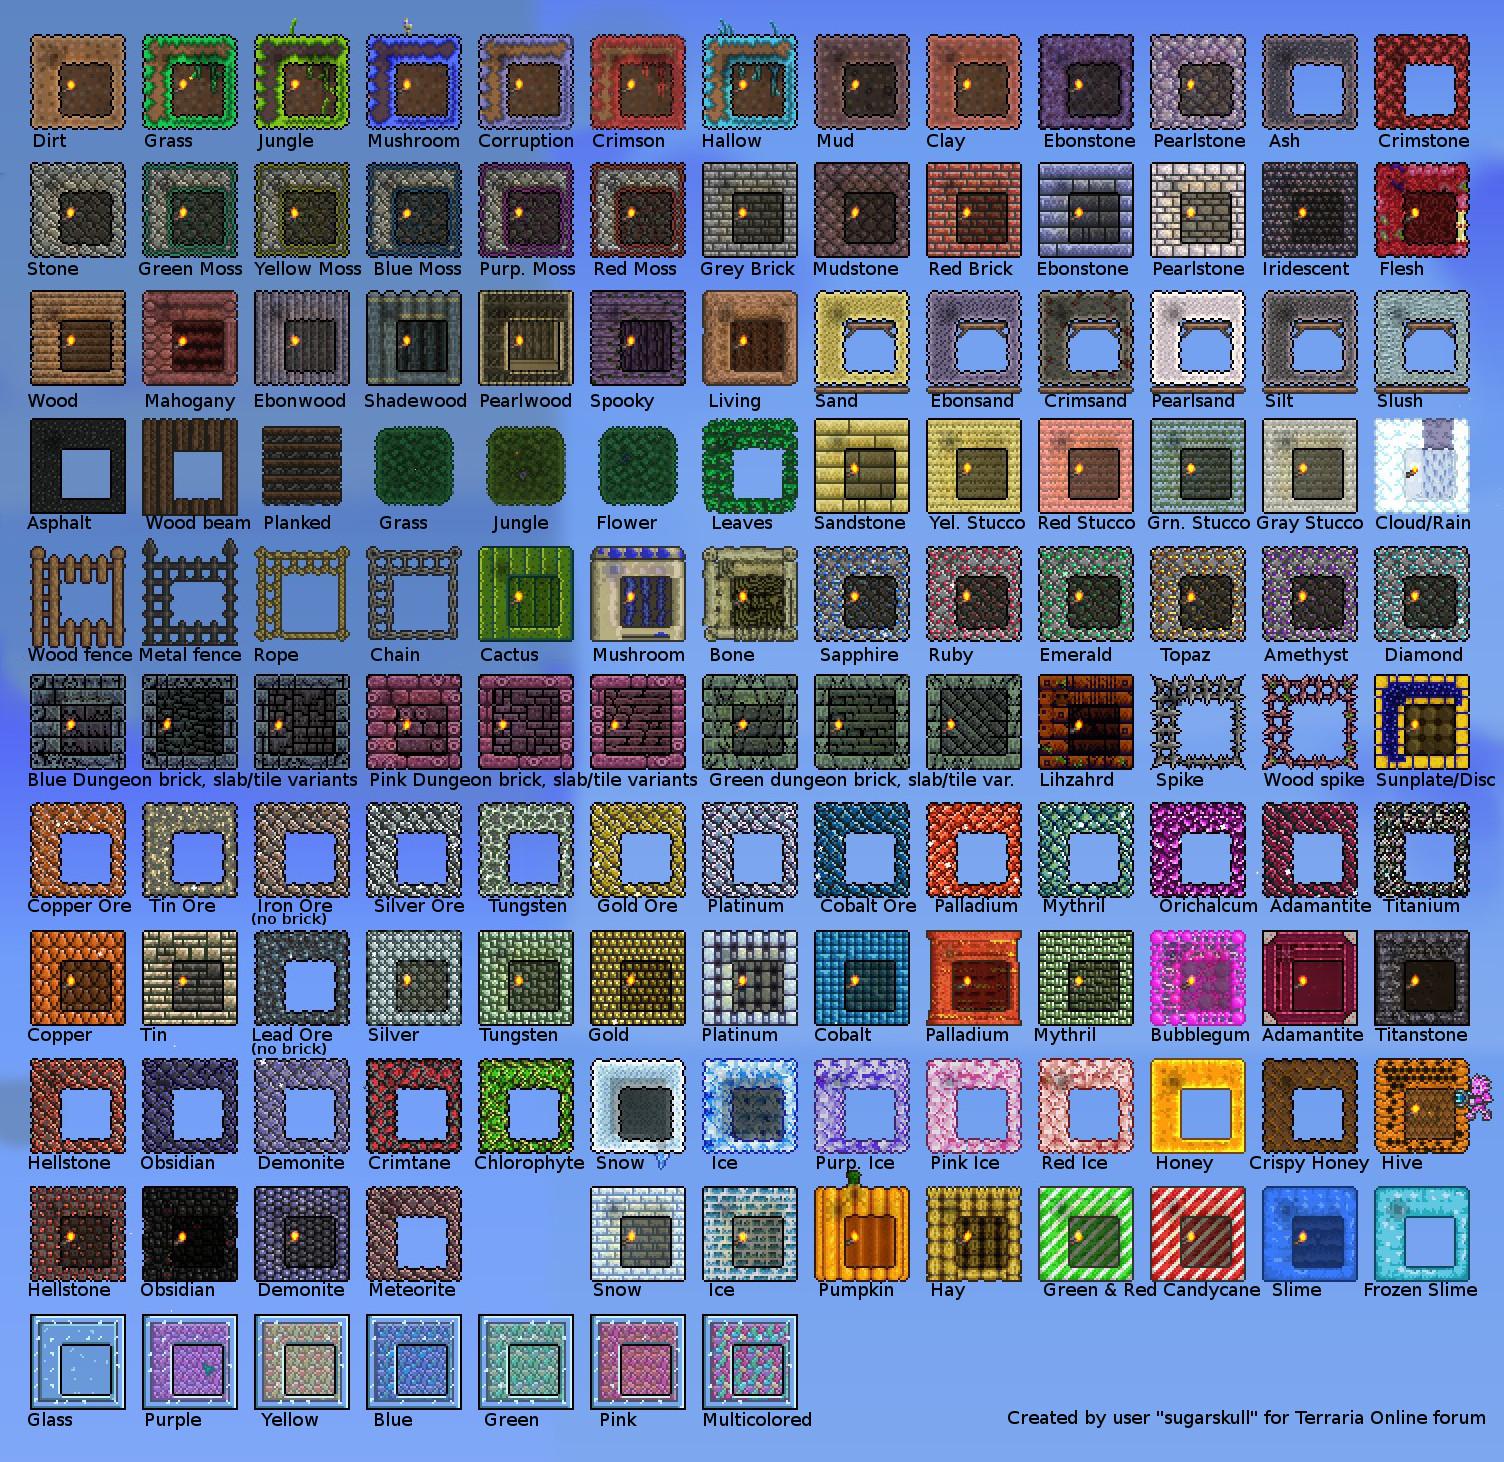 Stone Block Wall Terraria : Screenshot terraria reference image for walls and blocks